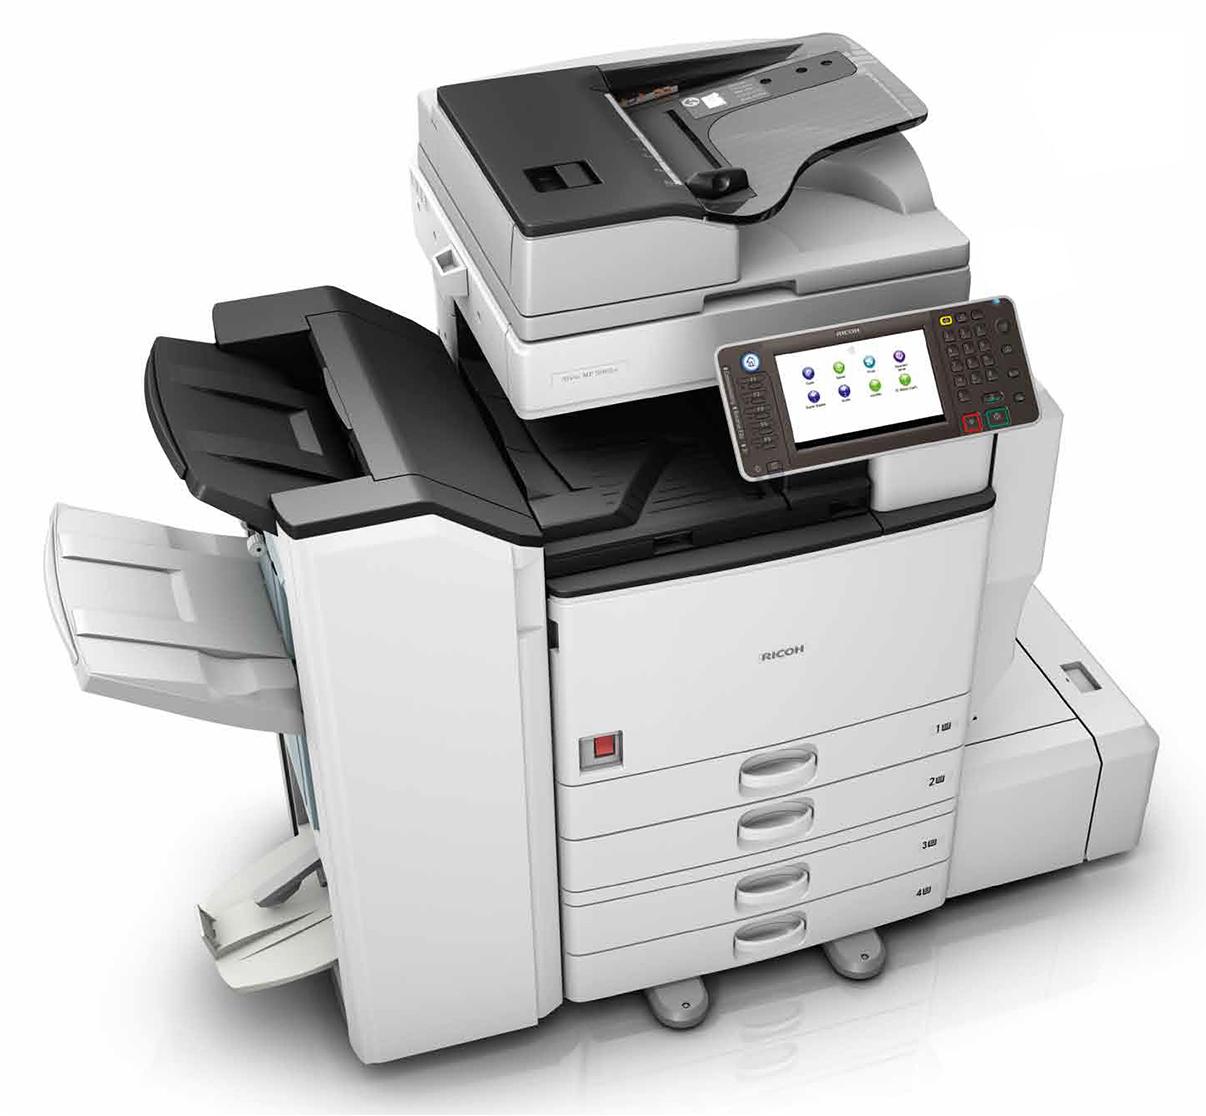 MP 4054 / MP 5054 / MP 6054 Series | American Business Equipment